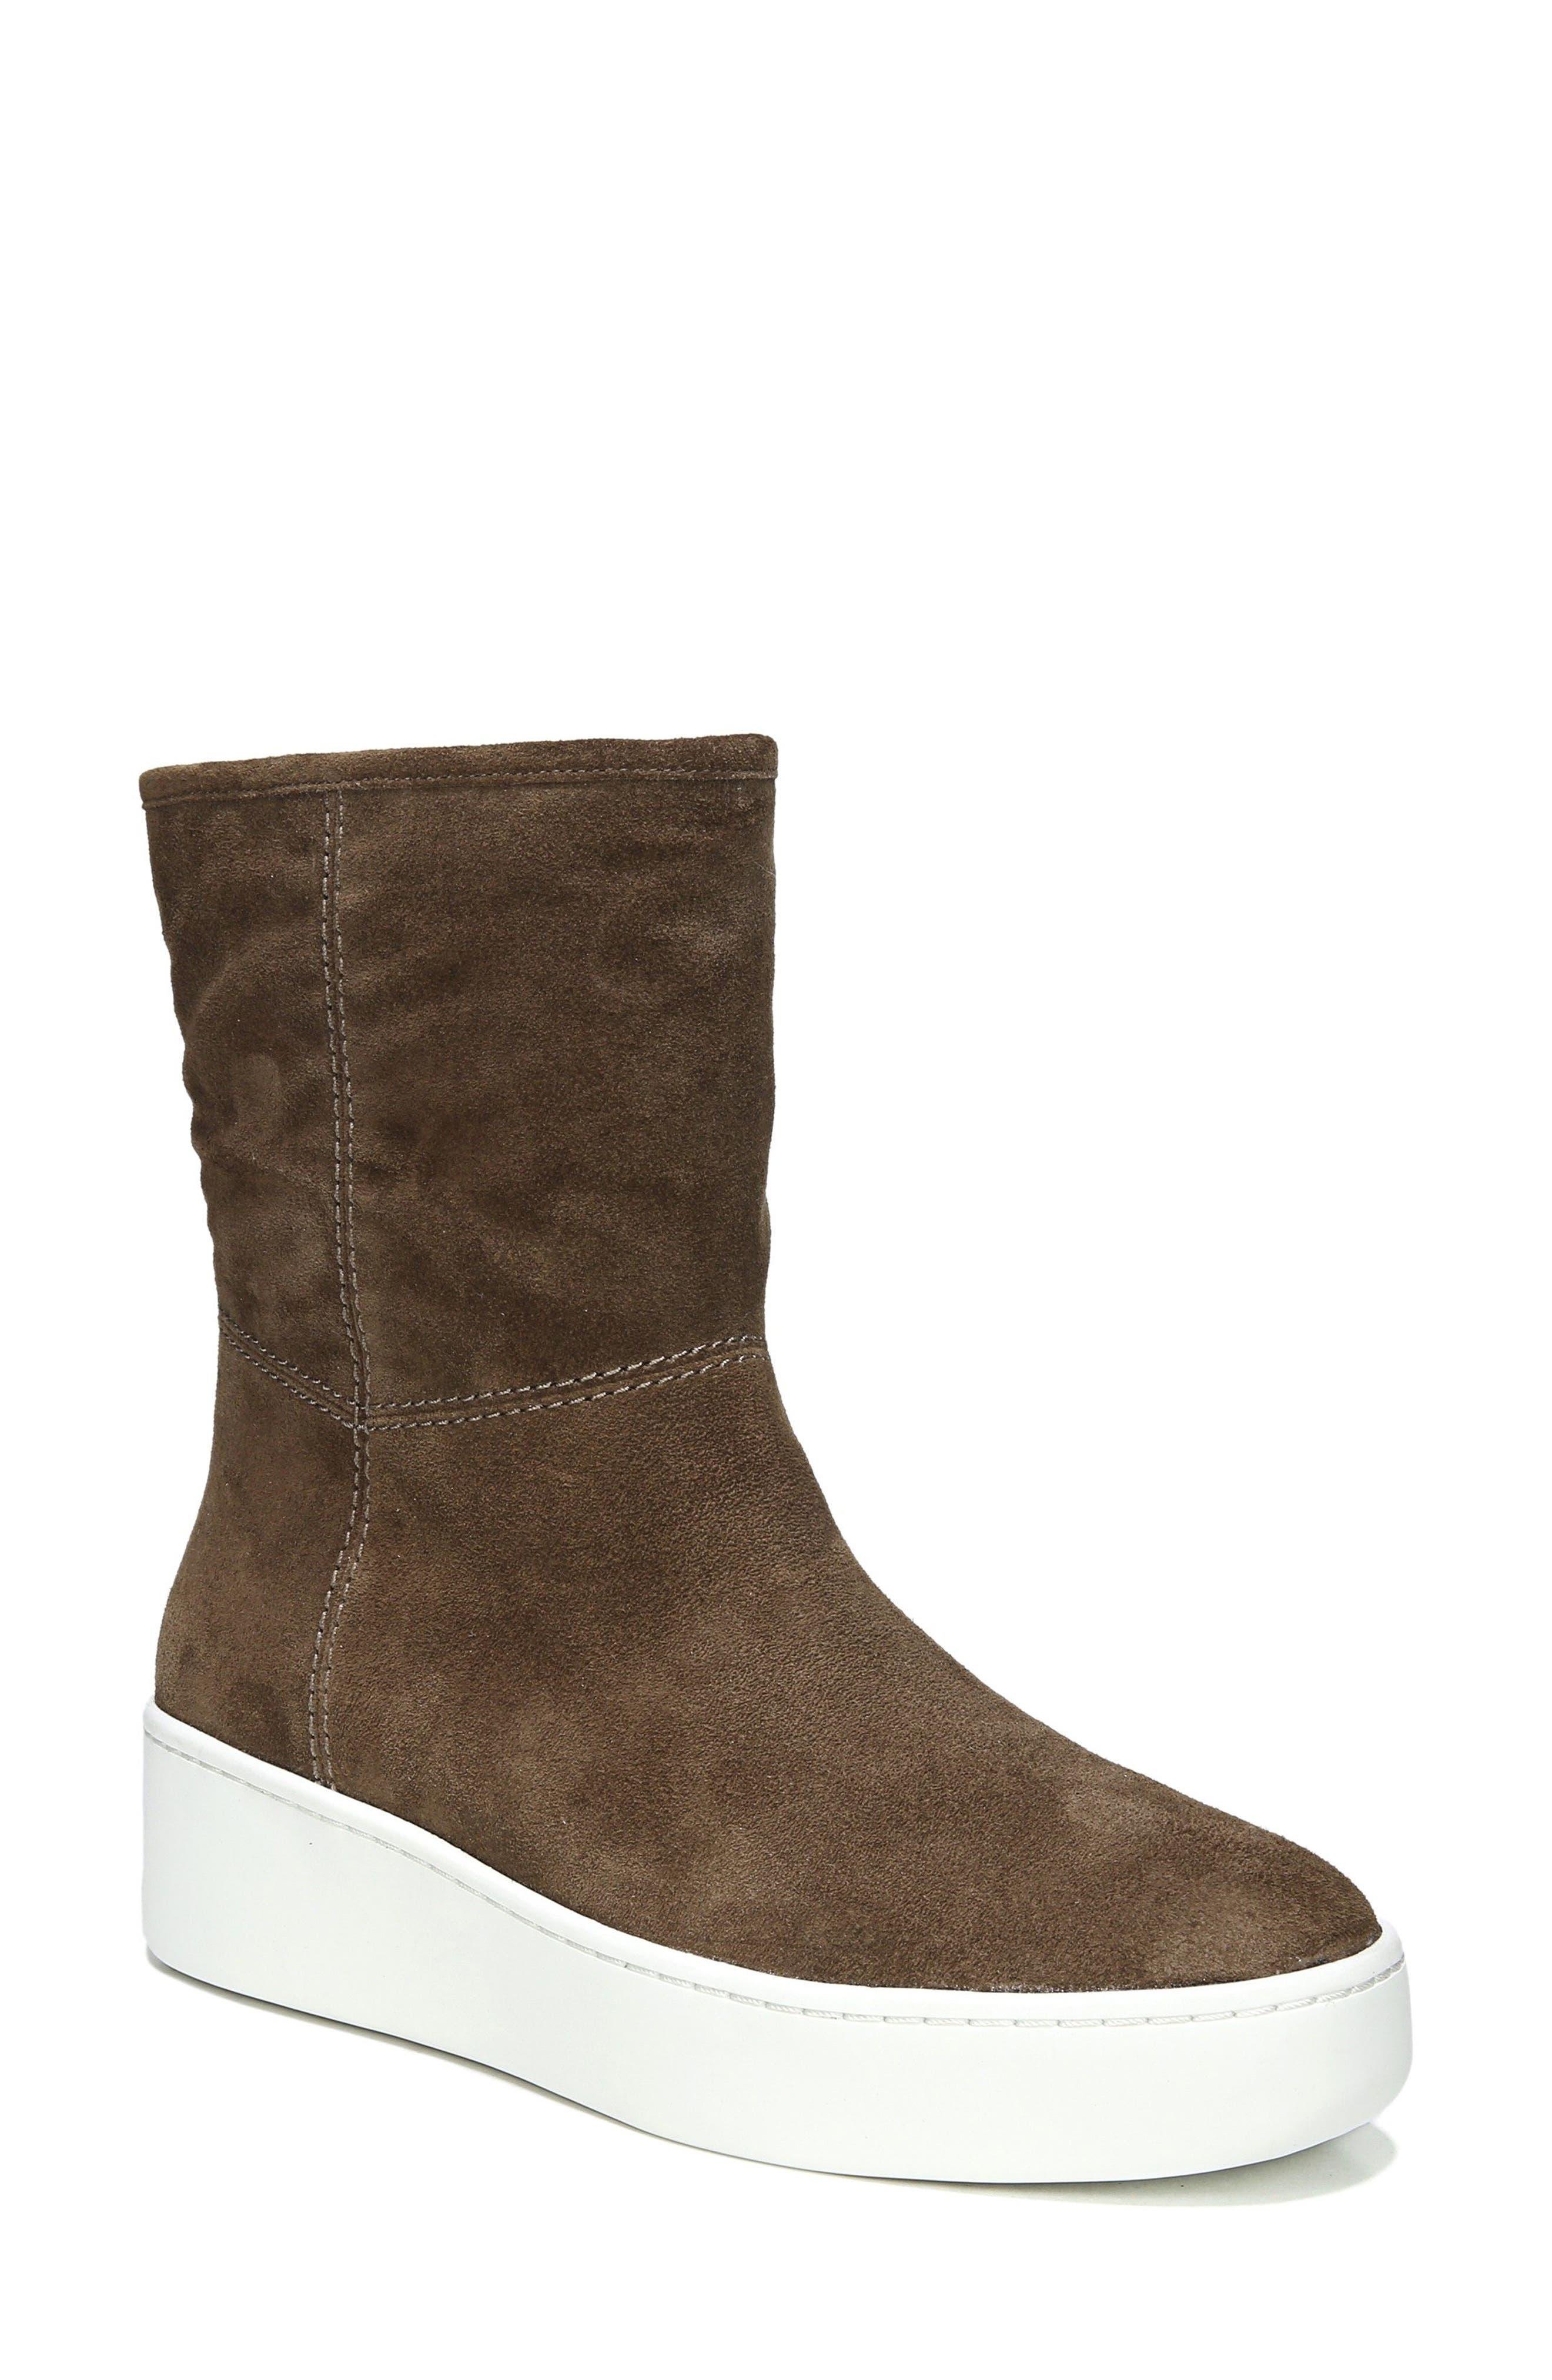 Main Image - Via Spiga Elona Genuine Shearling Lined Sneaker Boot (Women)